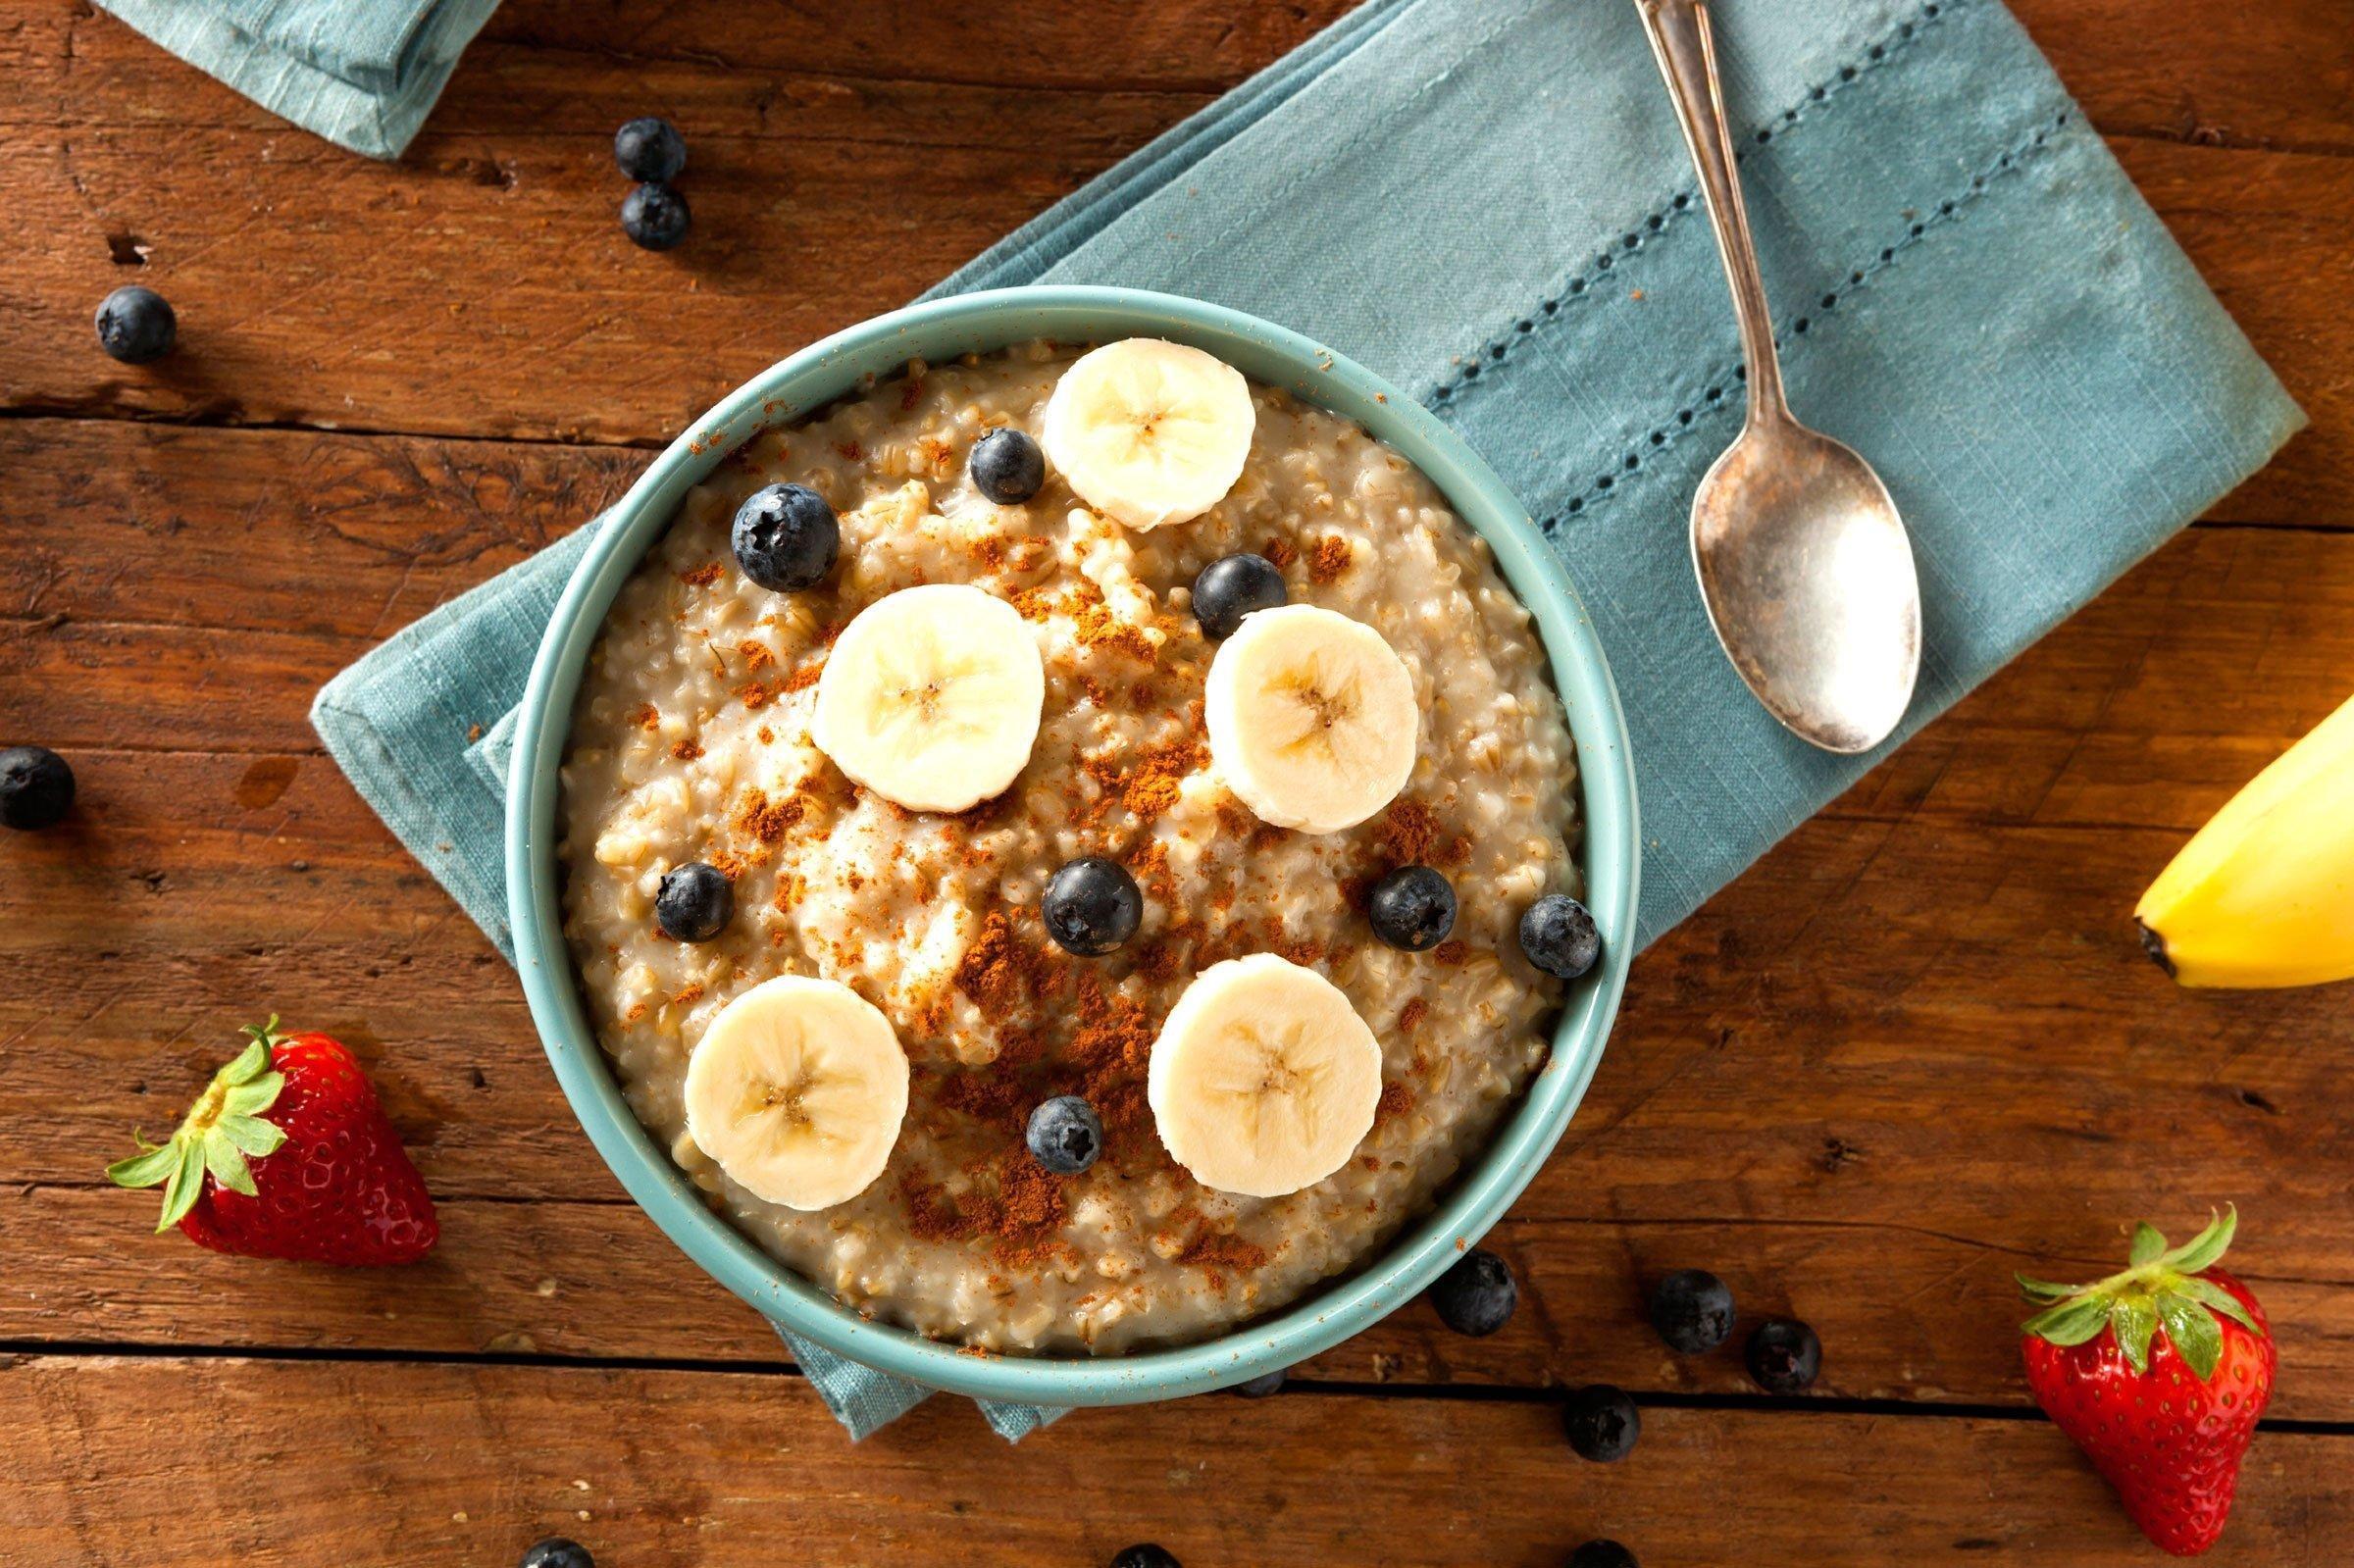 Eating Habits That Prevent Diabetes | Reader's Digest